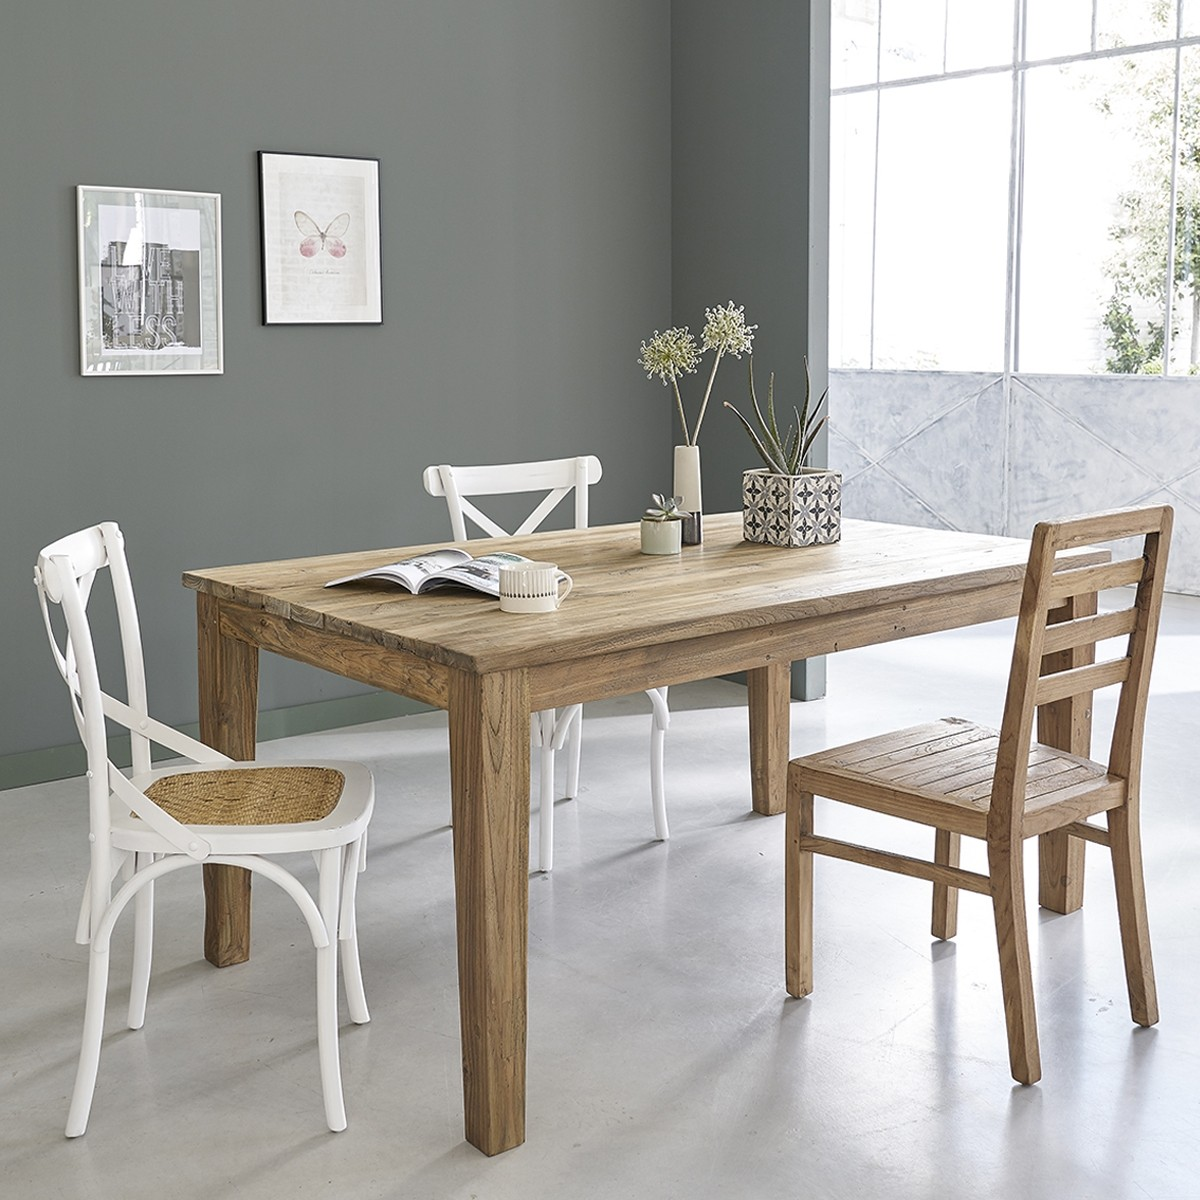 table extensible en bois de teck recycle 10 personnes cargo